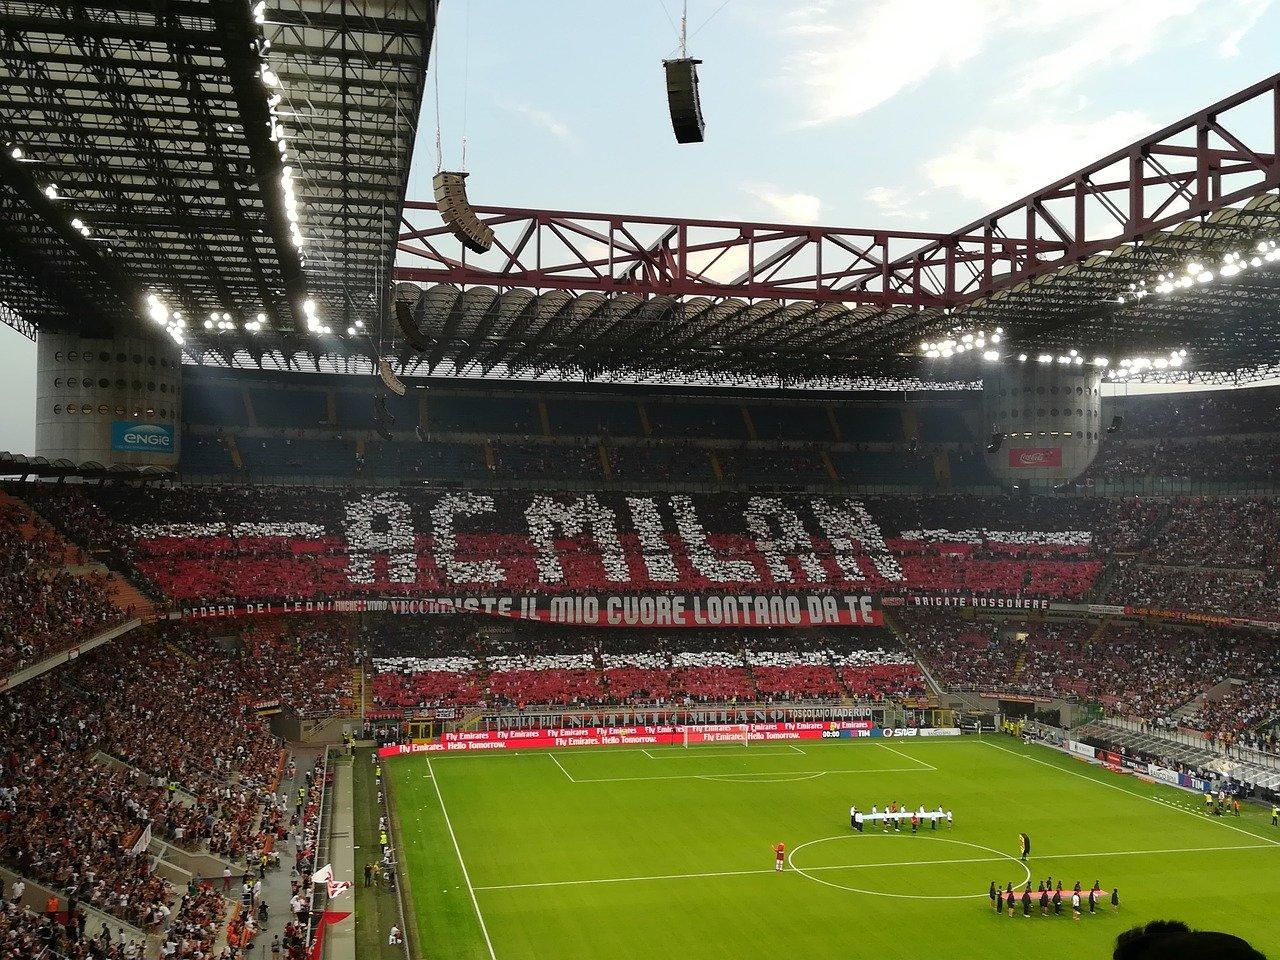 Corsa Champions - San Siro - Milan